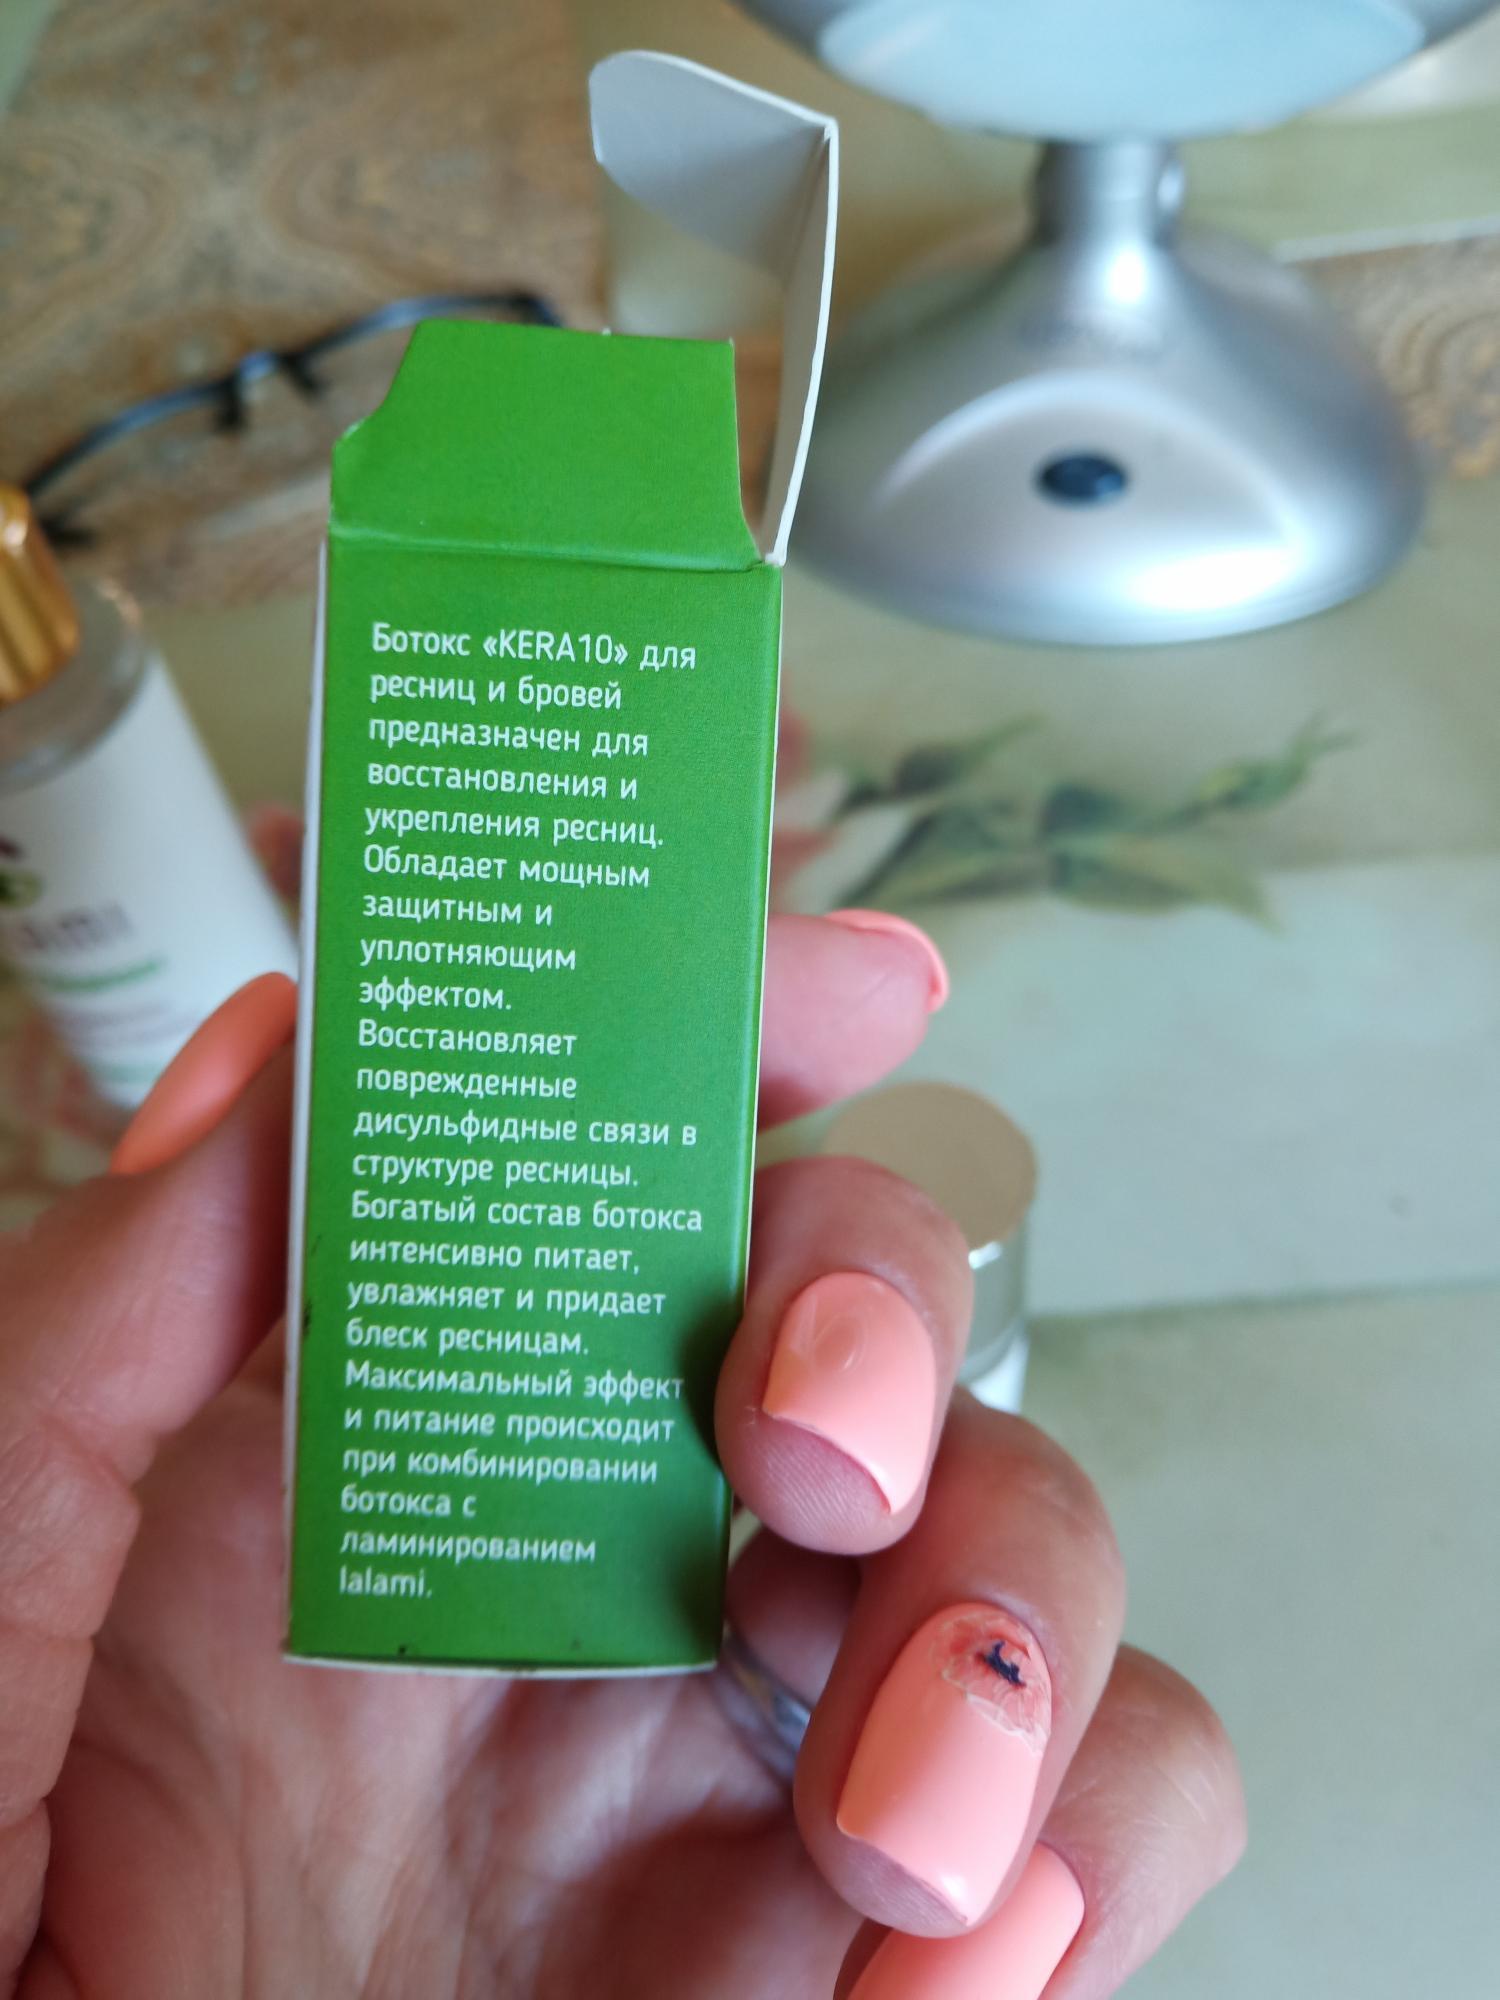 Ботокс для ресниц lash botox в Одинцово 89032760072 купить 4